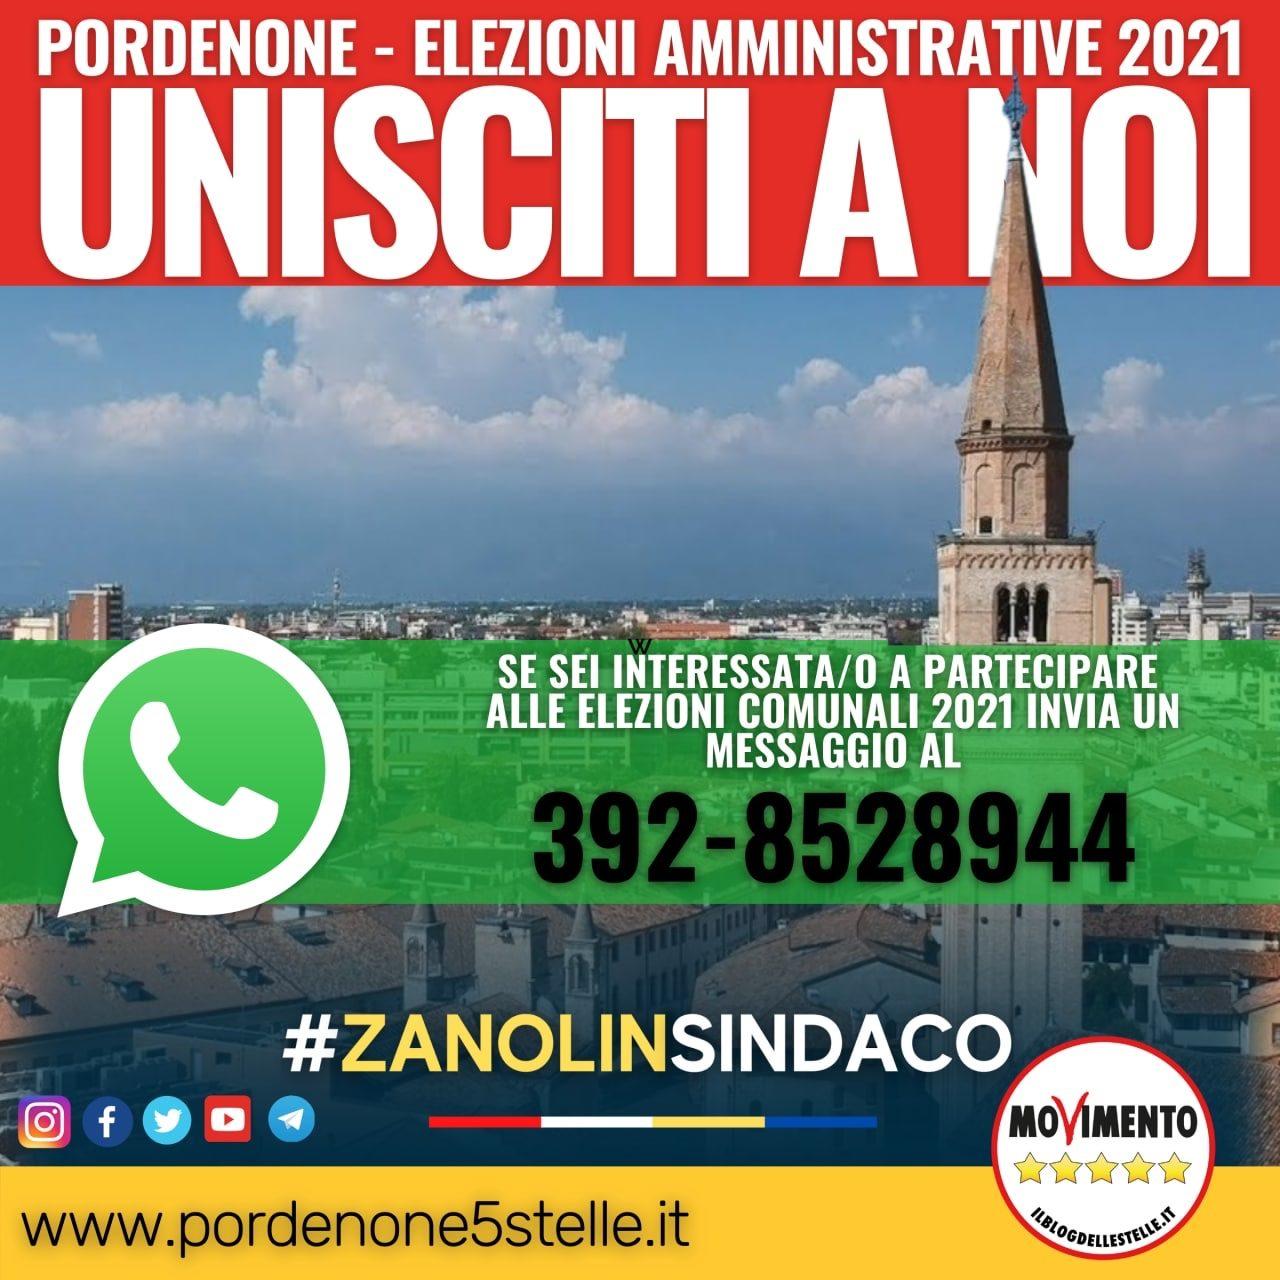 Unisciti a noi per #ZanolinSindaco